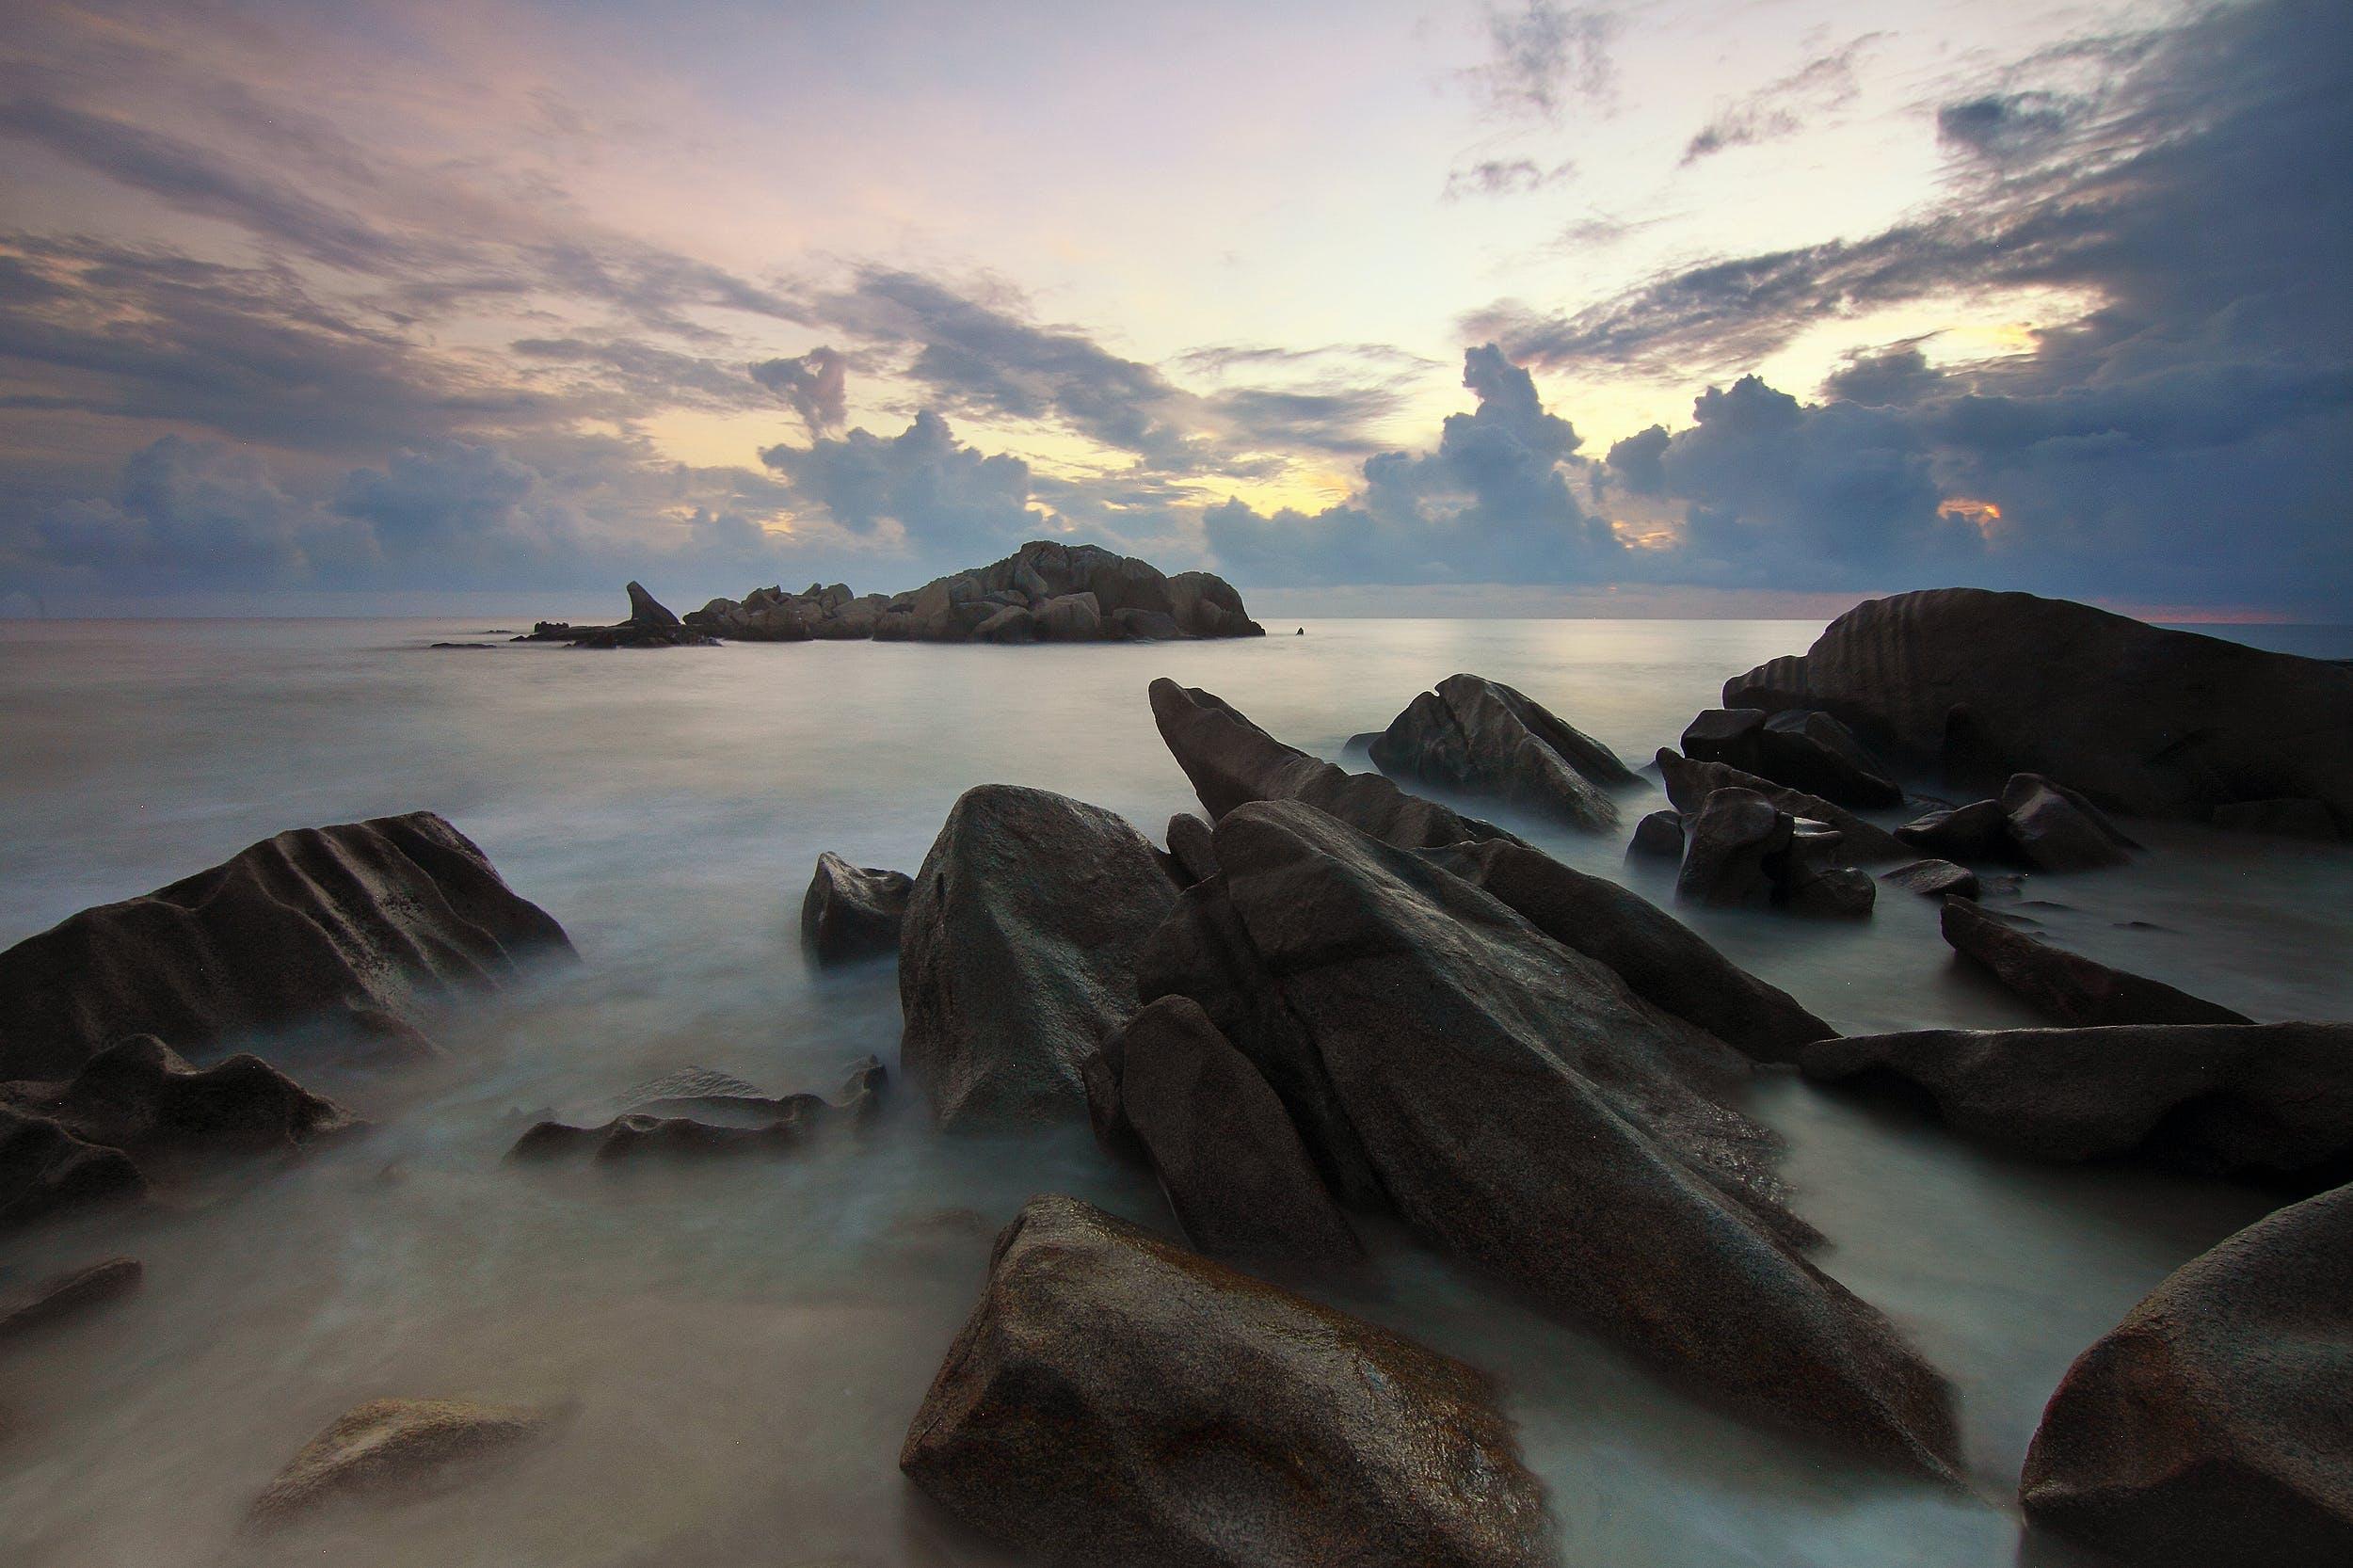 beach, nature, ocean